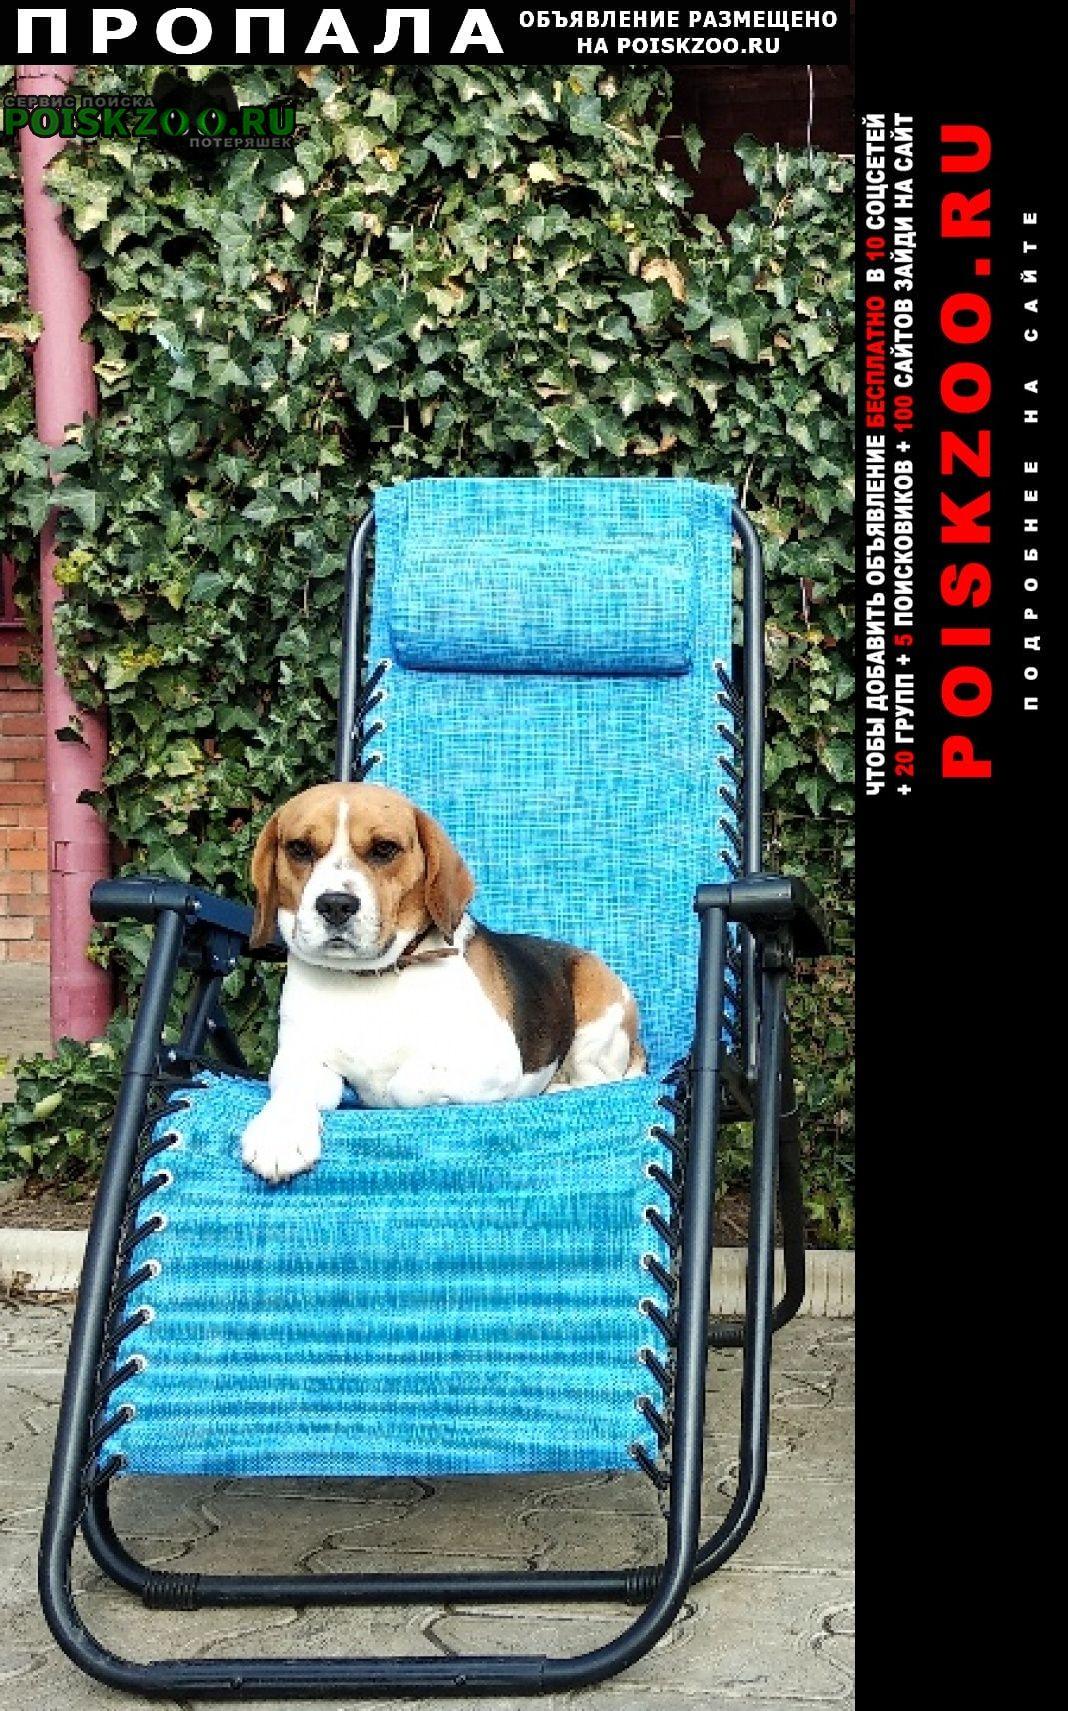 Пропала собака бигль, с.успенское, краснодарский край Армавир